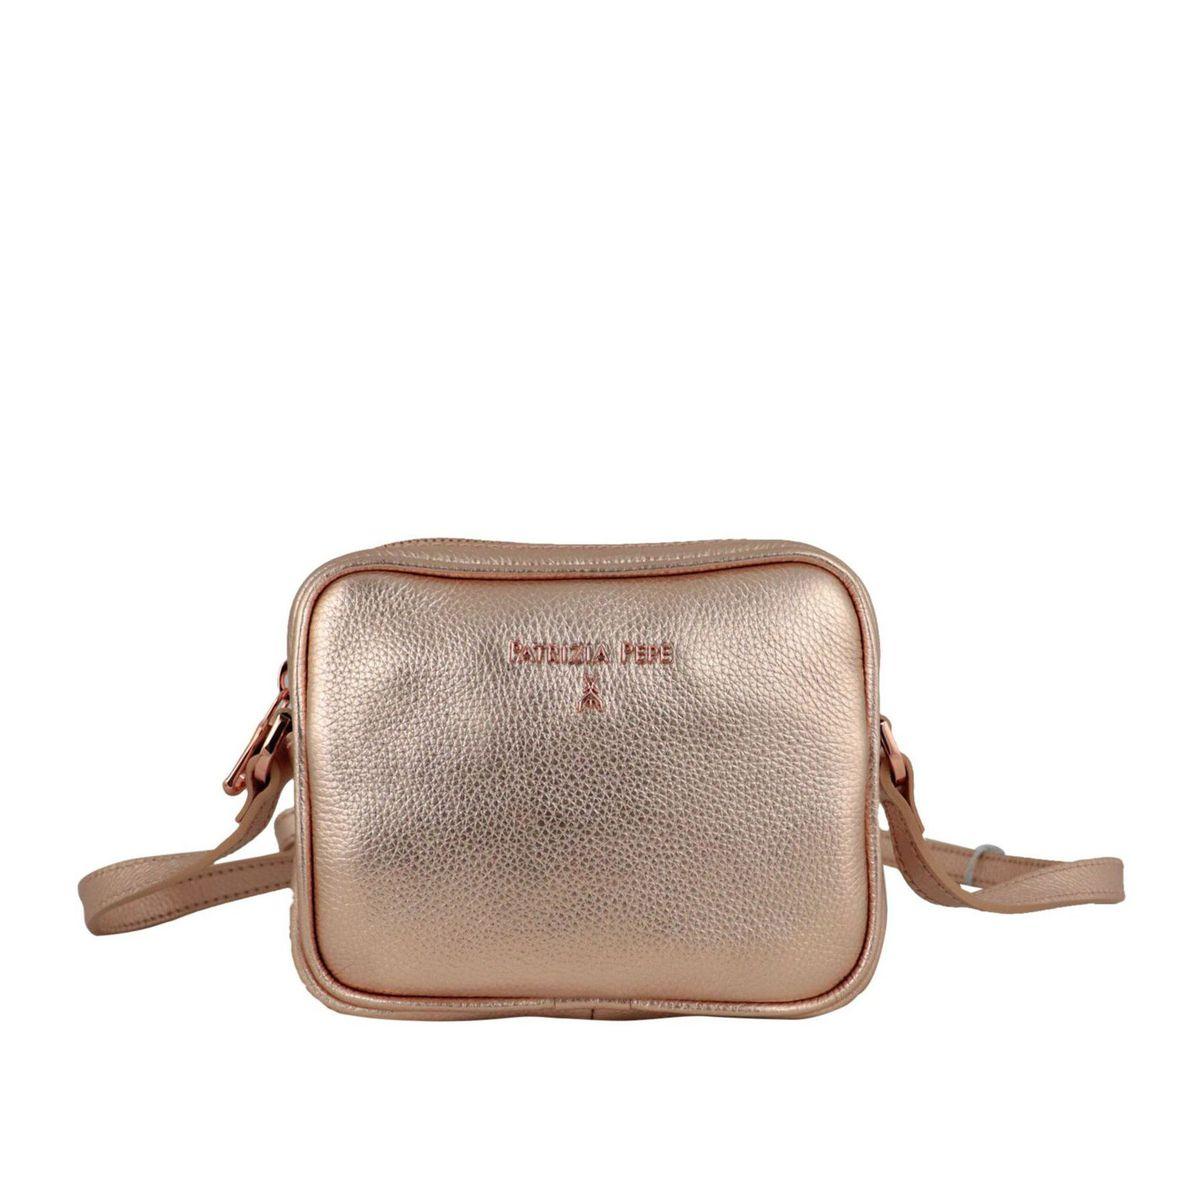 Shoulder strap in metal leather Pink gold Patrizia Pepe